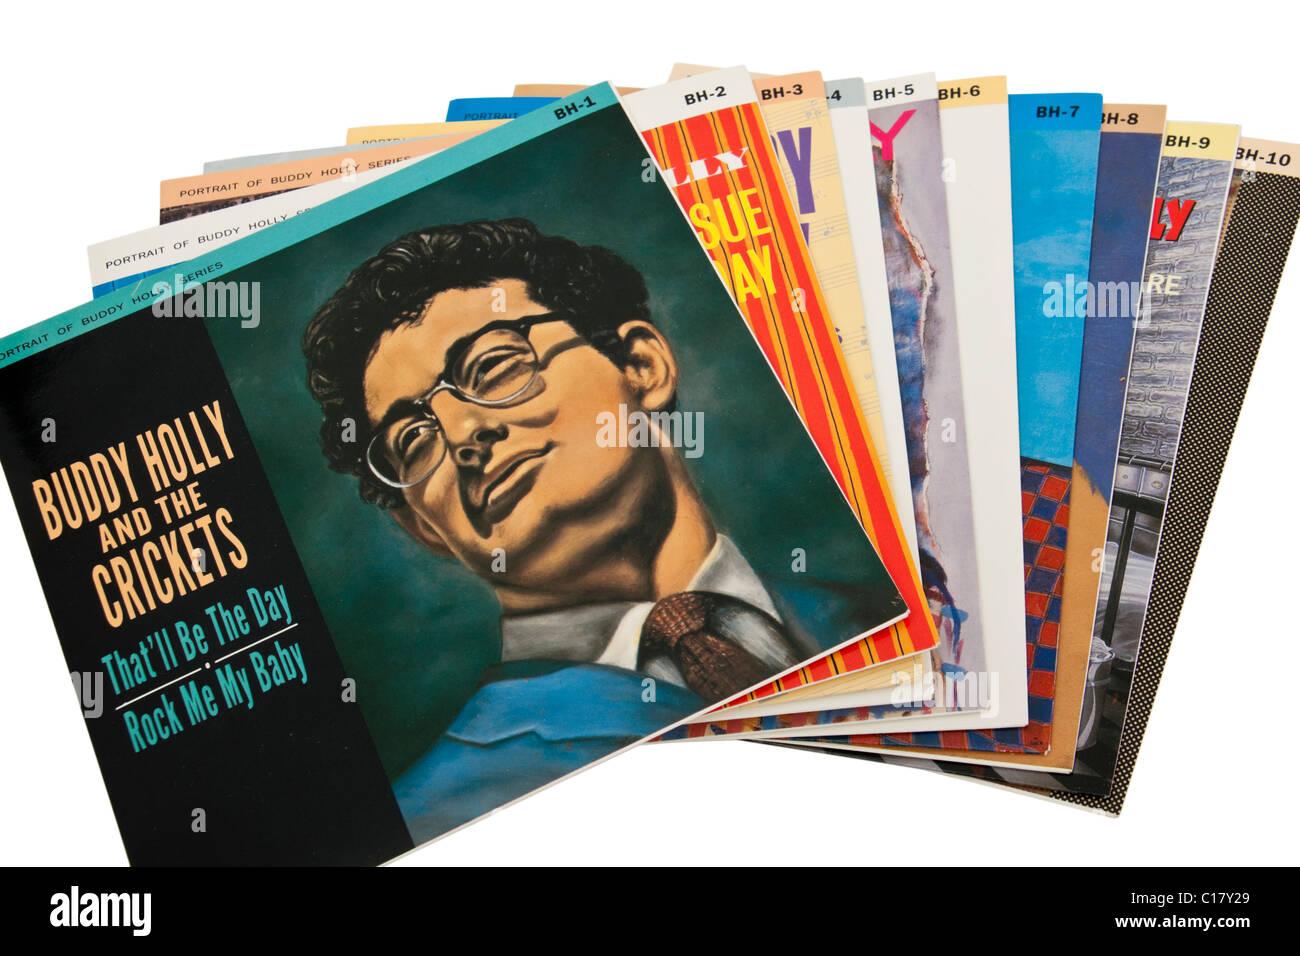 Sammlung von Buddy Holly-Vinyl-Schallplatten / 7' Single / EP Stockbild